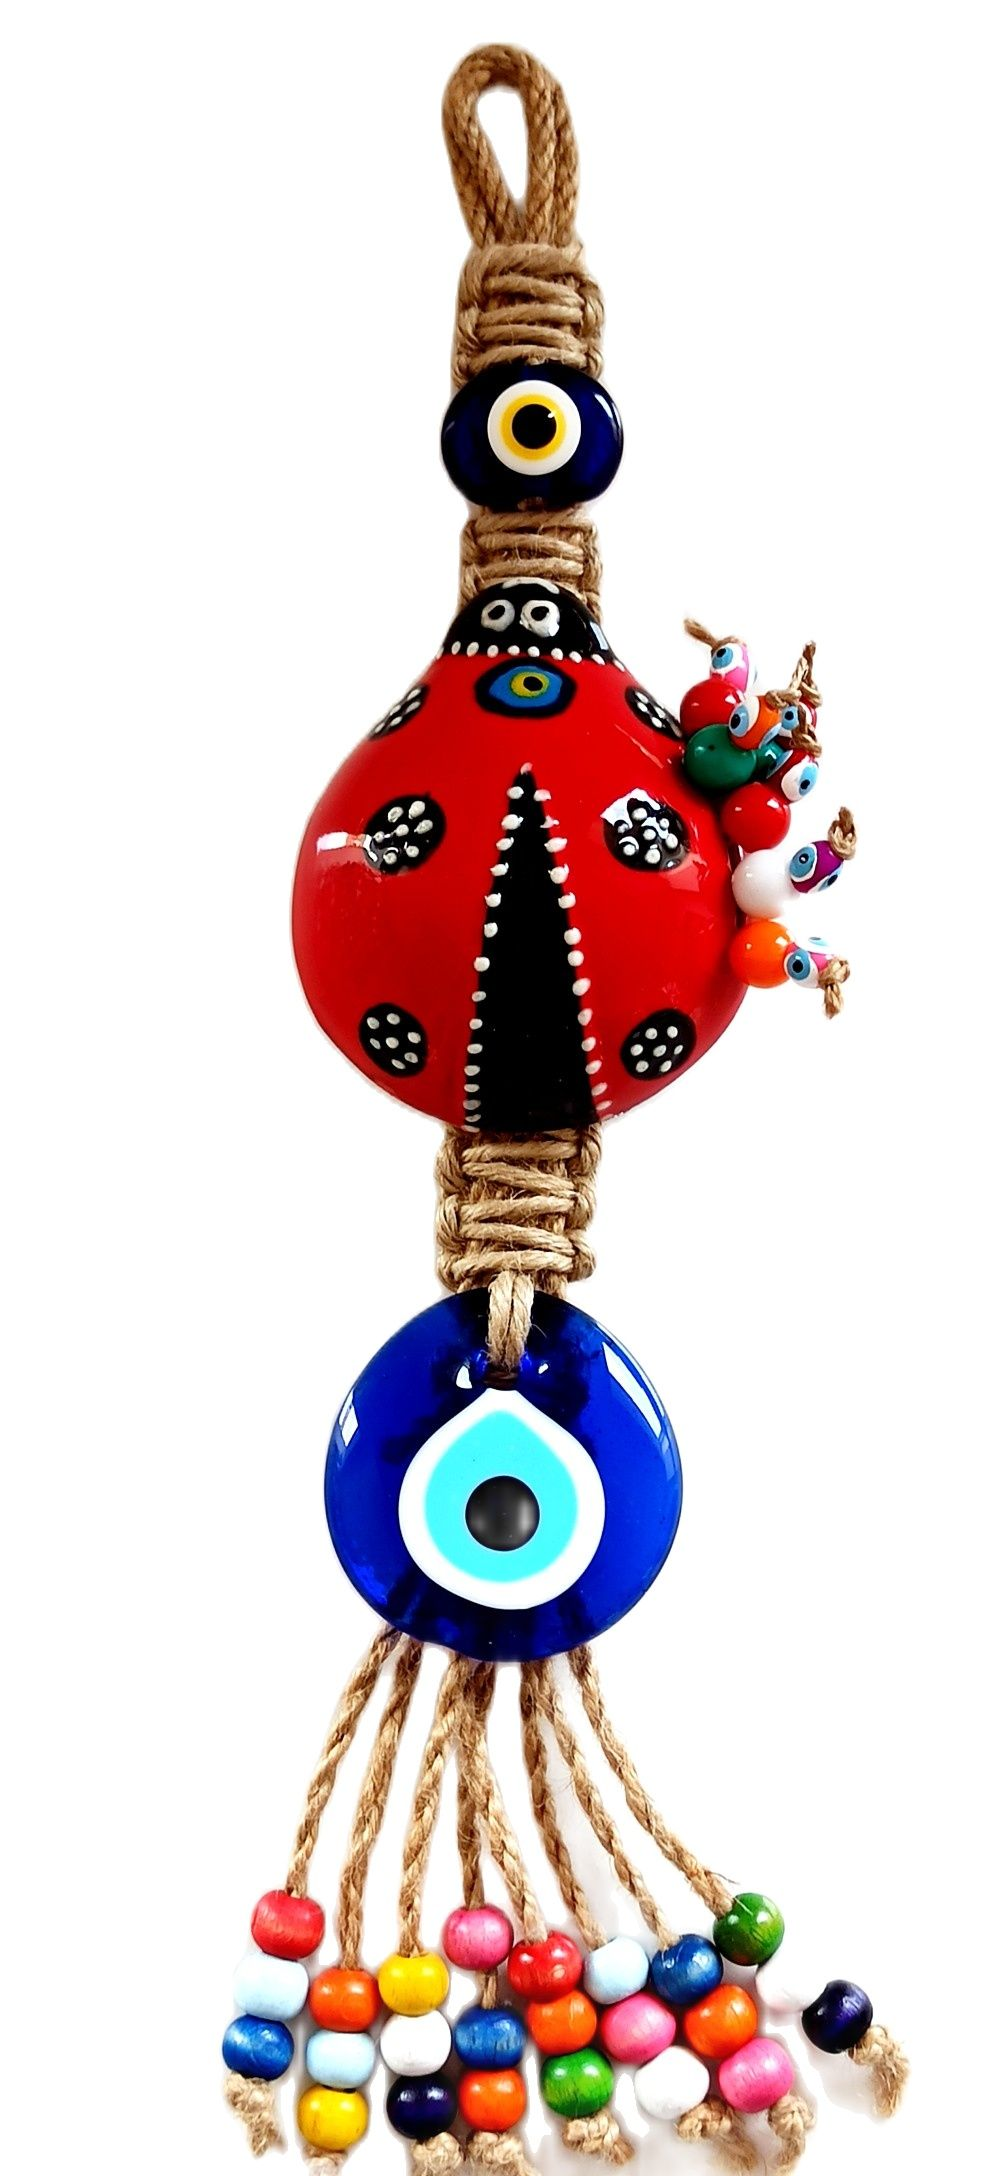 Red Ladybug Evil Eye Beads Ceramic Small Size Handmade Wall Ornament